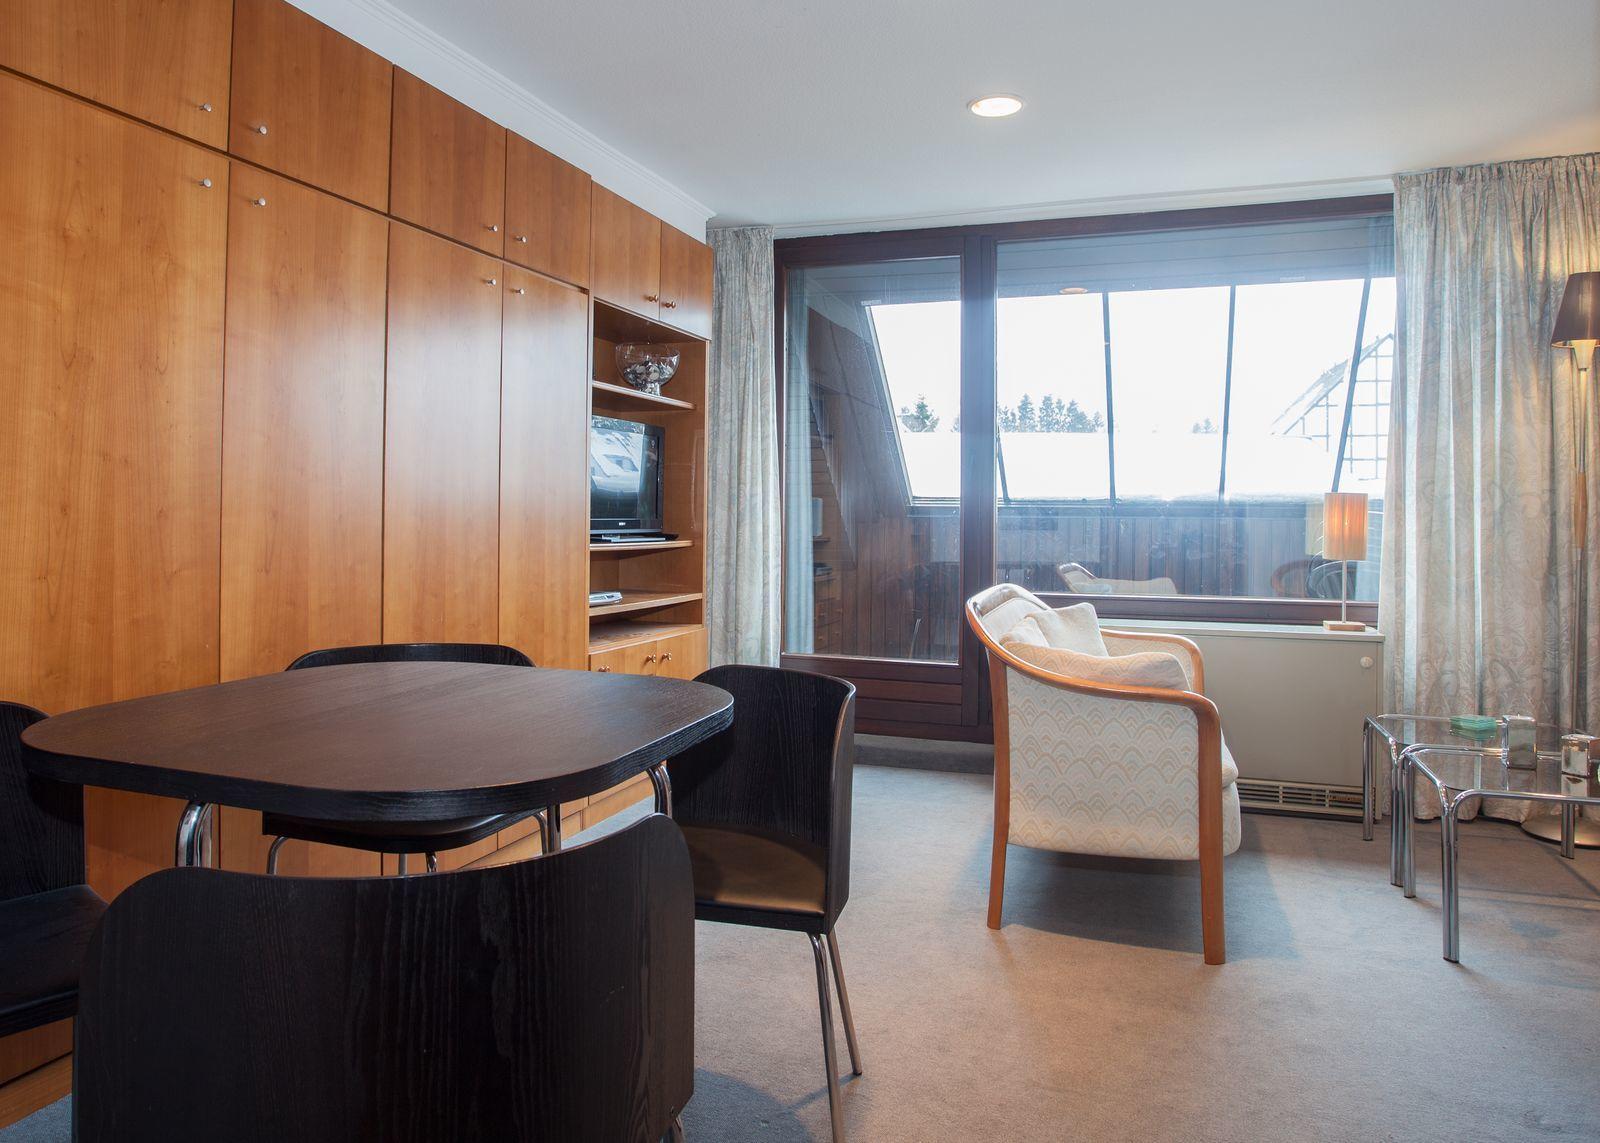 Apartement - Dr. Sürenstrasse 13-10